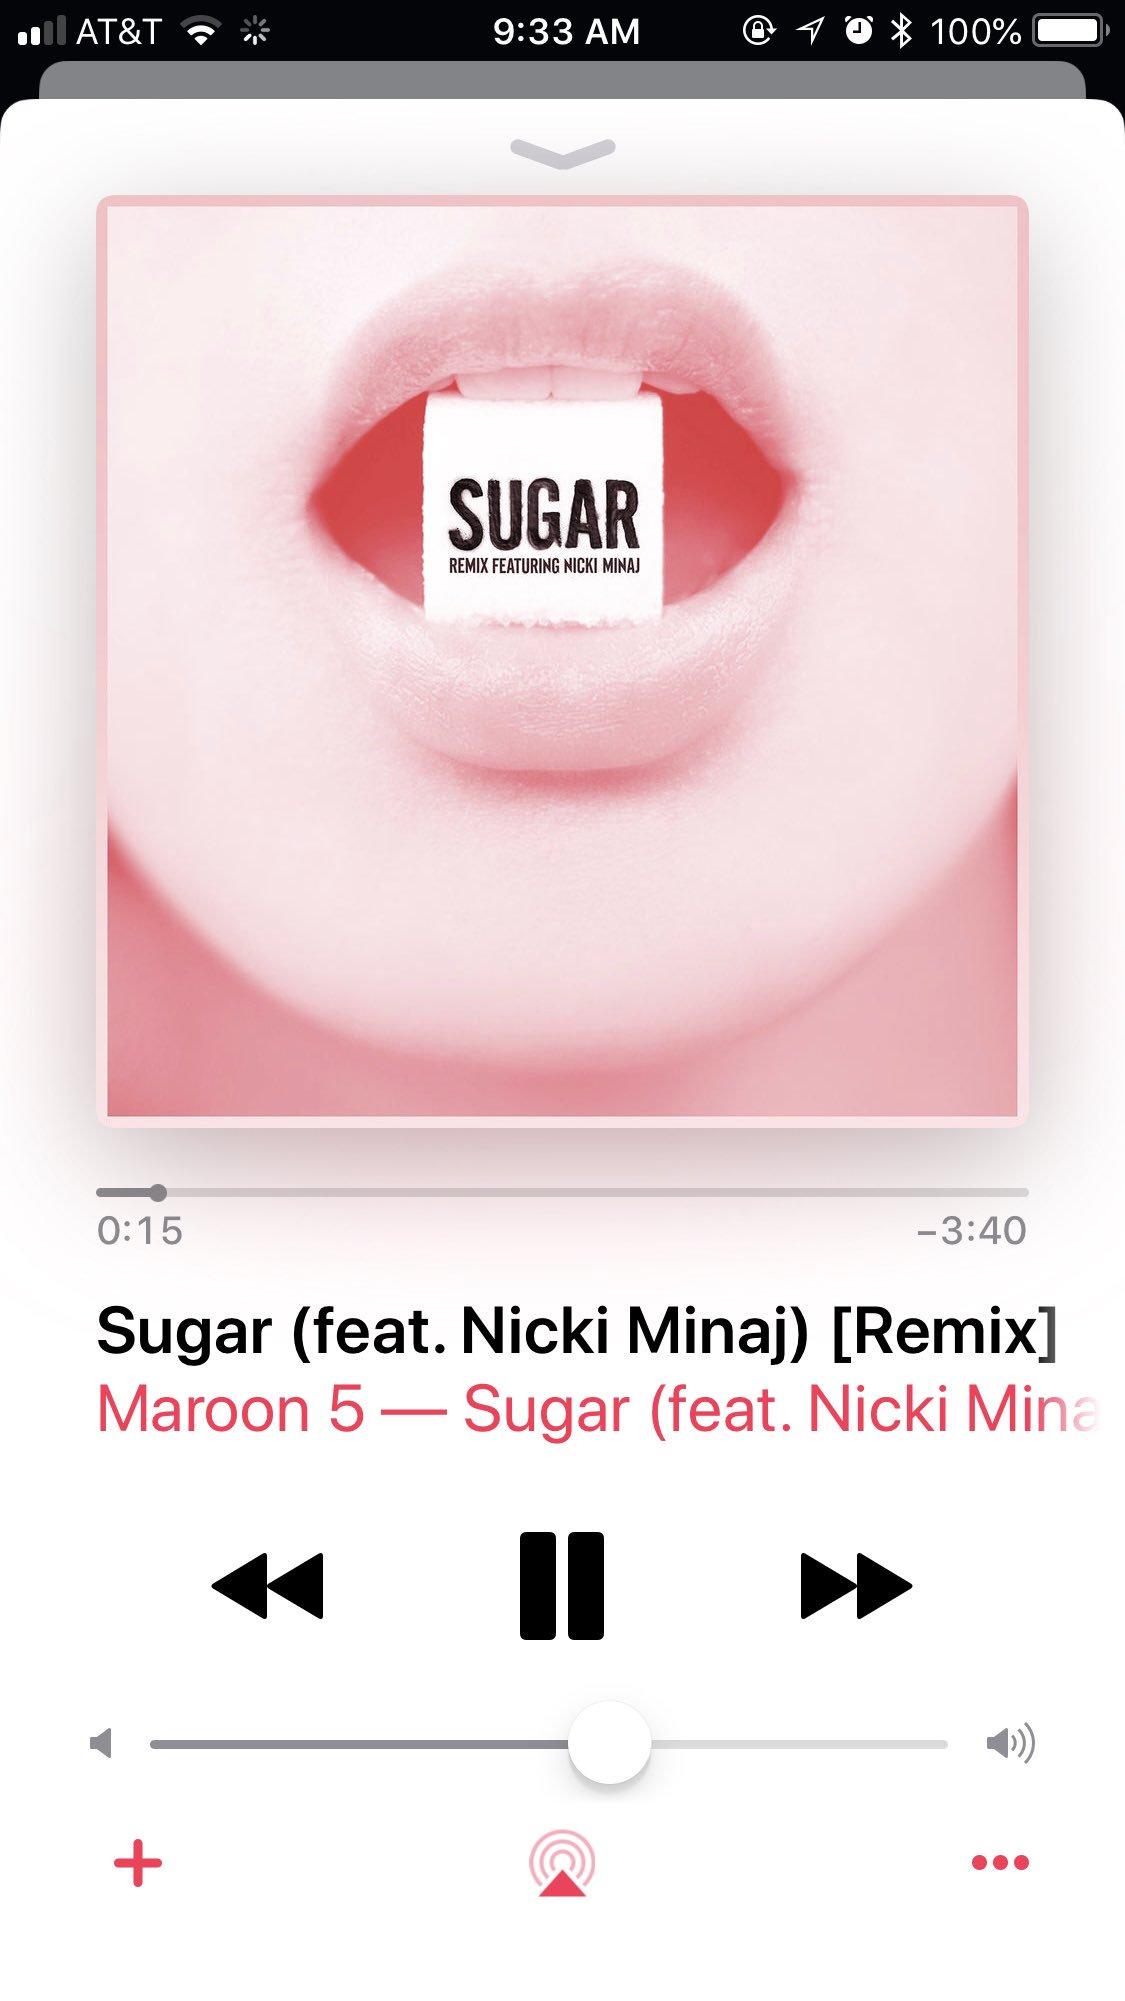 •Retweet for Sugar Remix with Nicki Minaj   •Fav for Girls Like You Remix with Cardi B https://t.co/MBtw0ChOgf